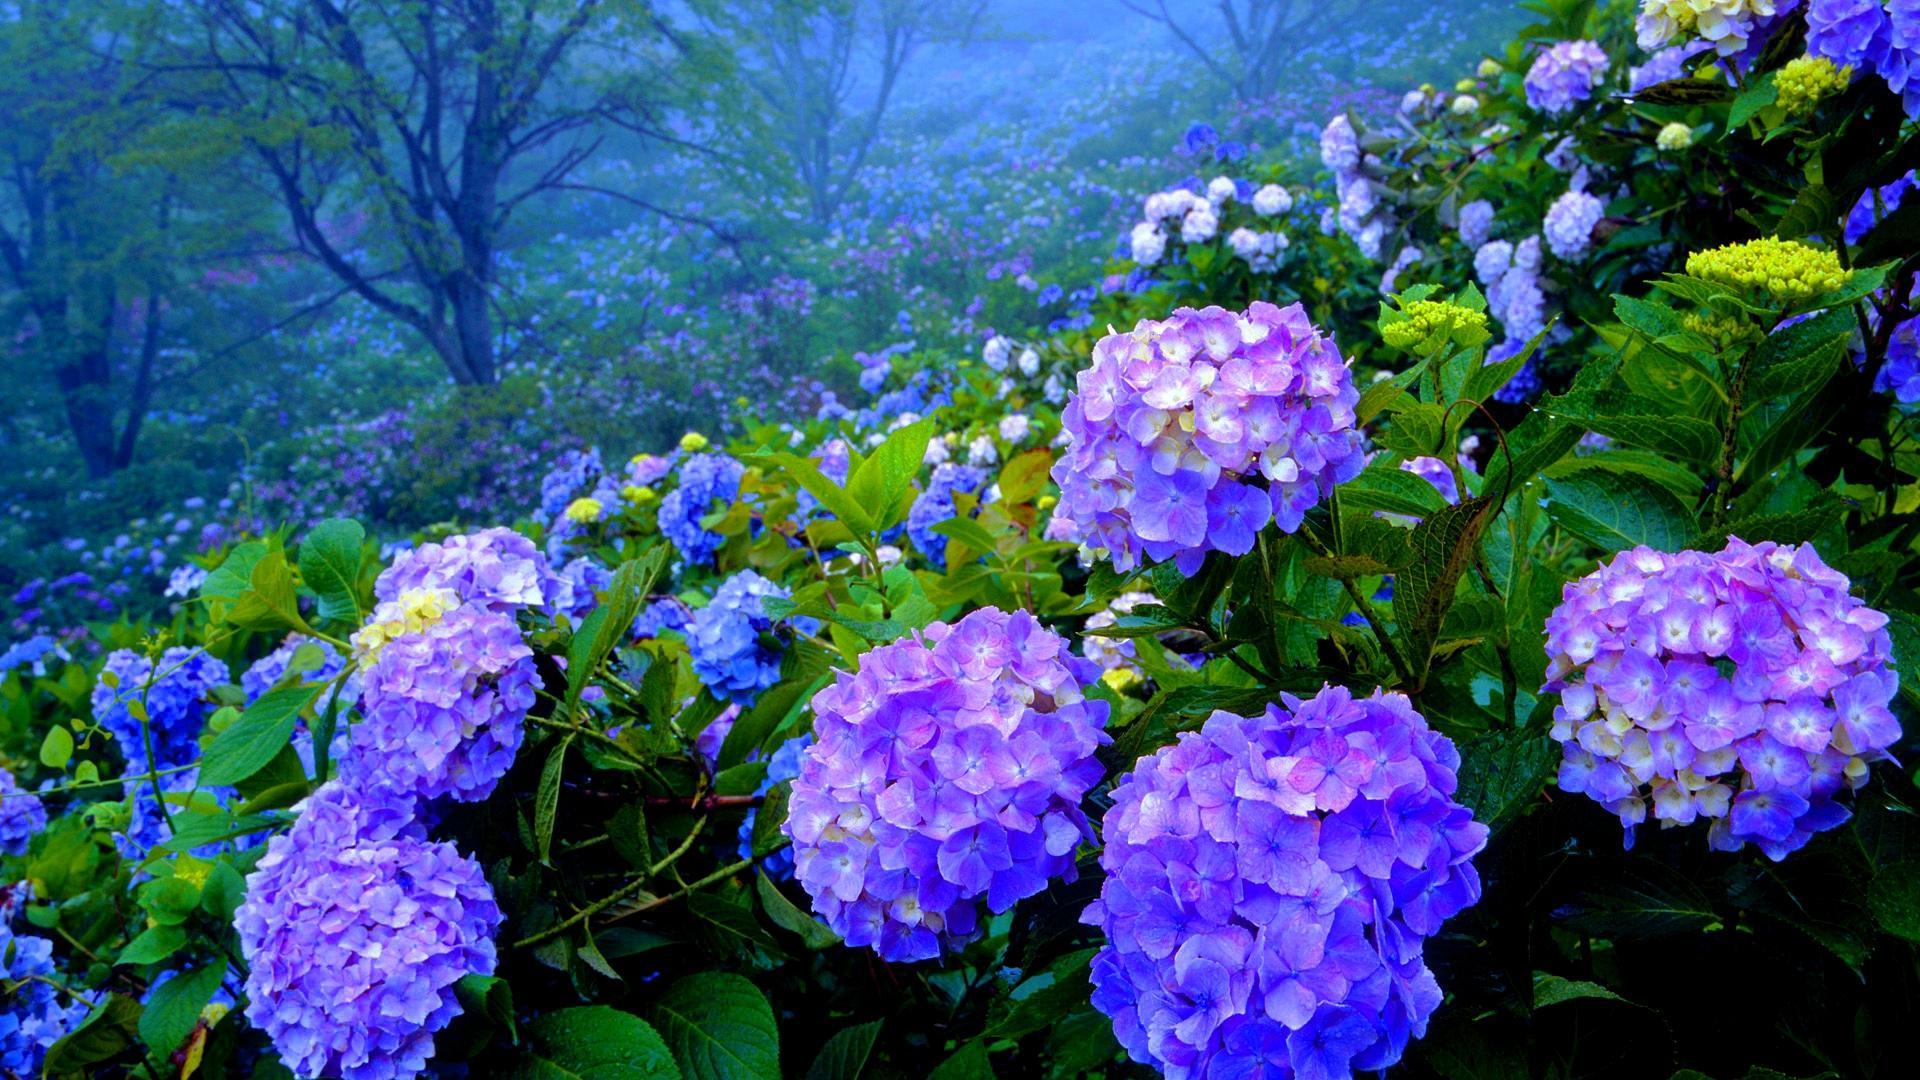 Beautiful Hydrangea Garden Hd Wallpaper Wallpaper List 1920x1080